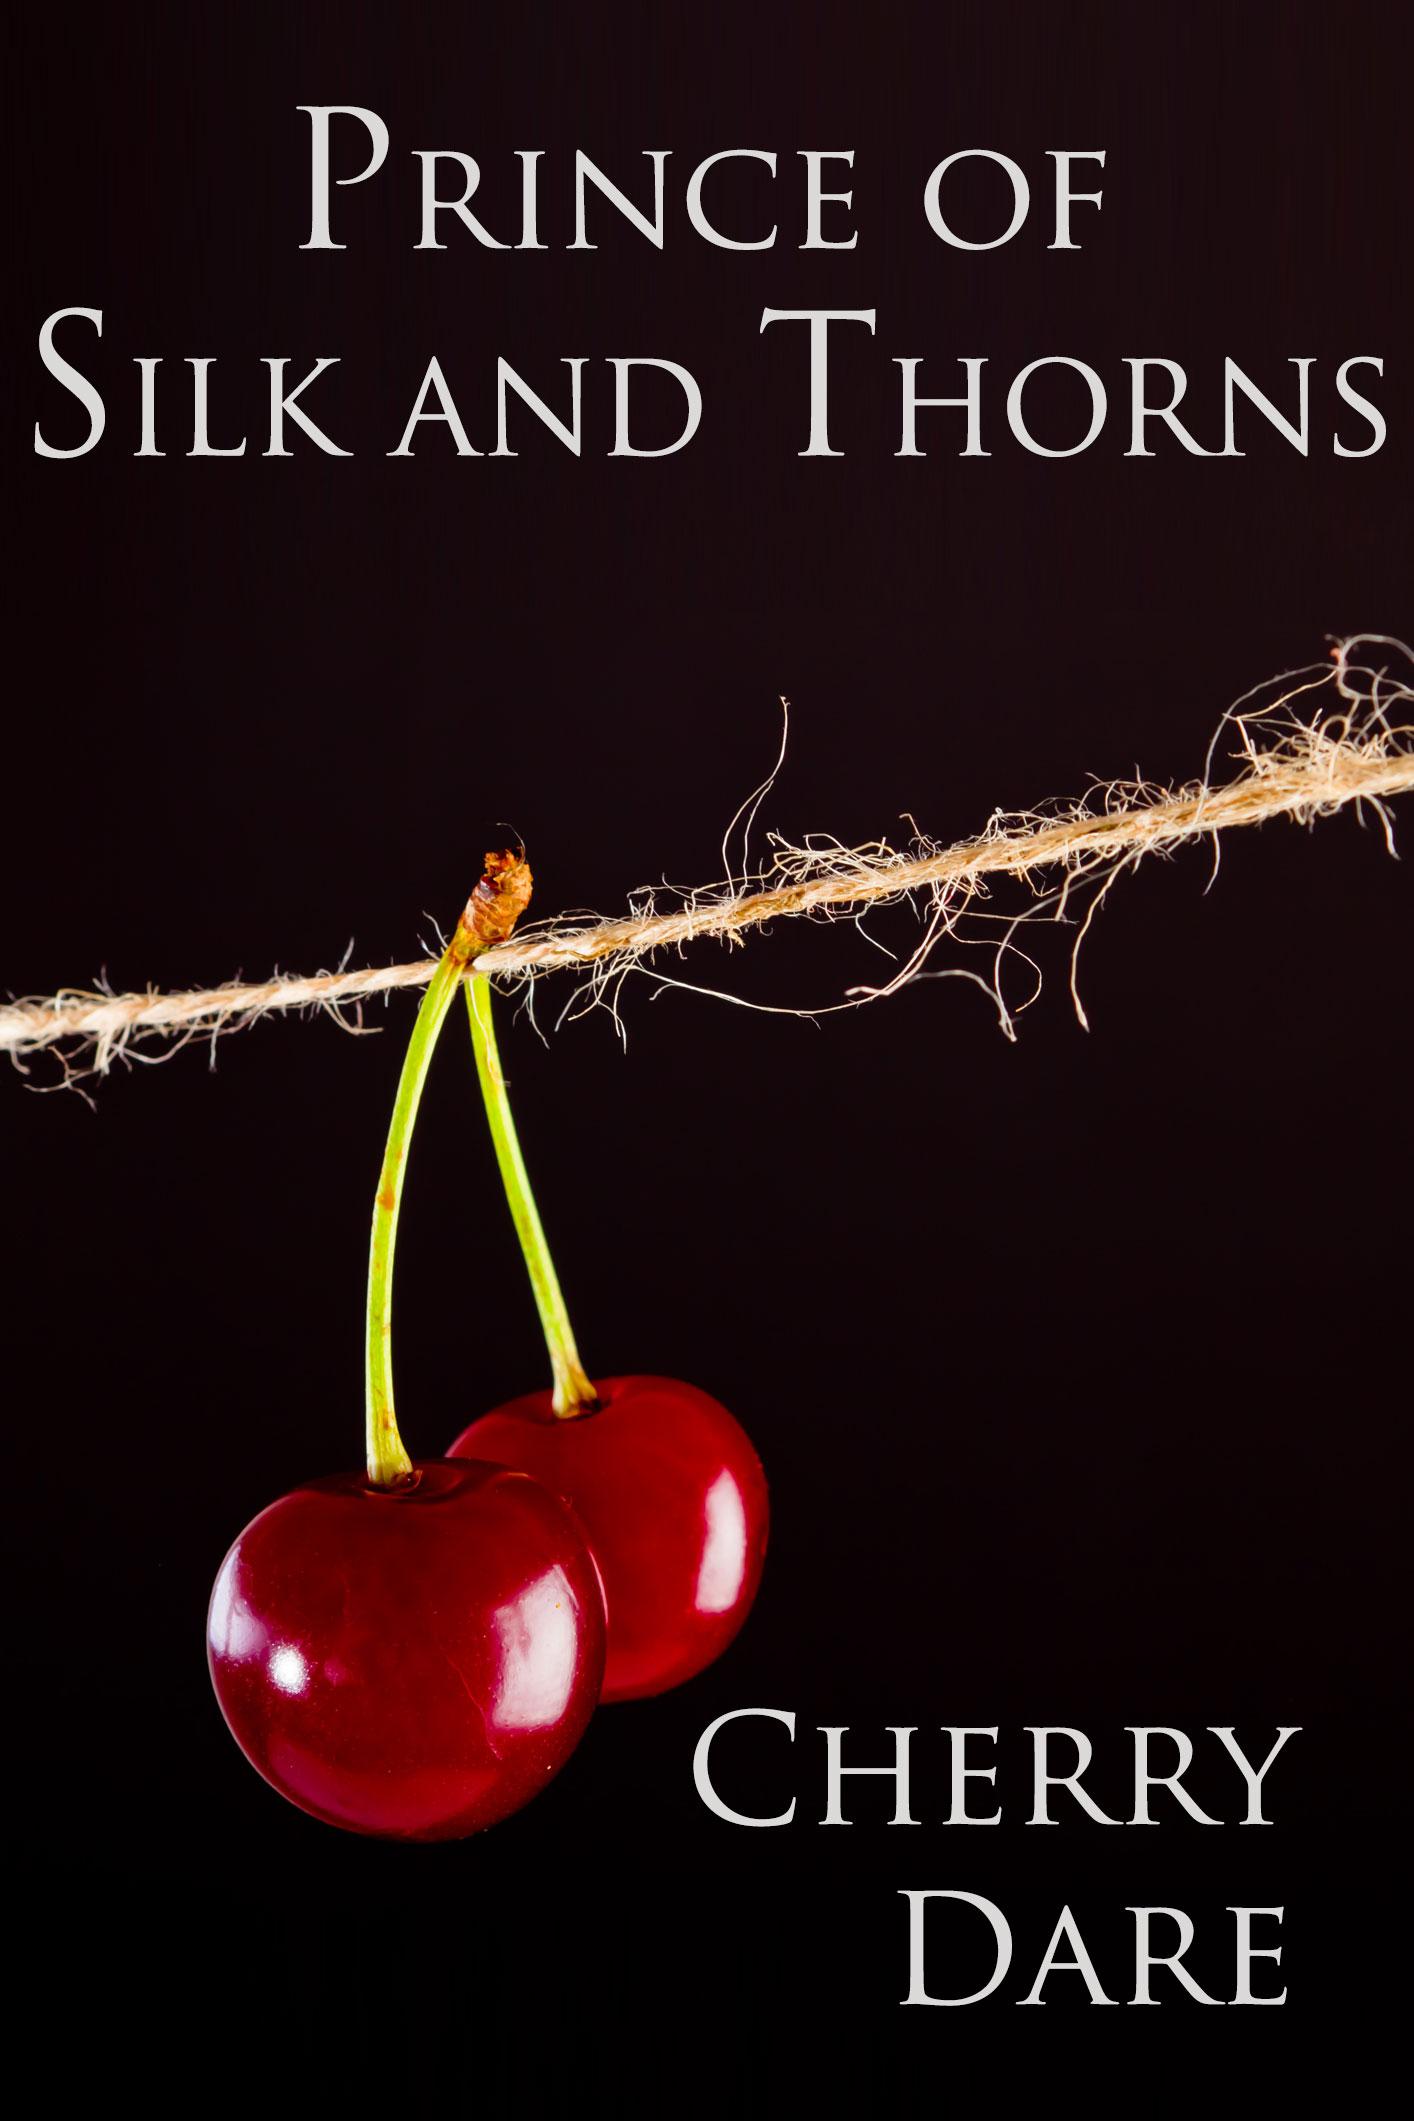 Prince of Silk and Thorns